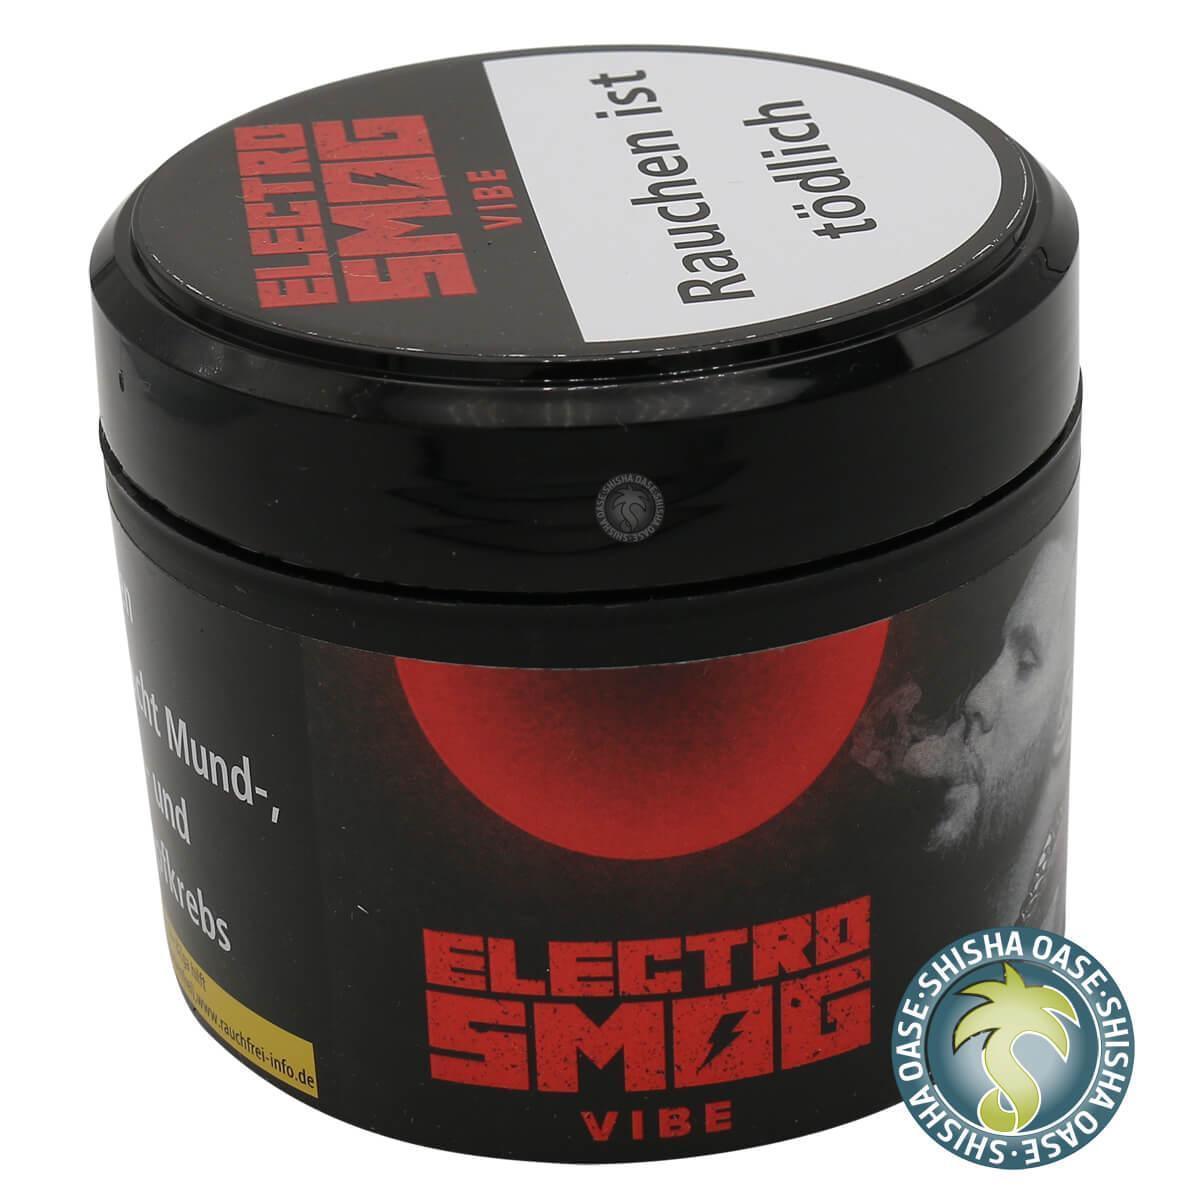 Electro Smog Tabak 200g | Vibe